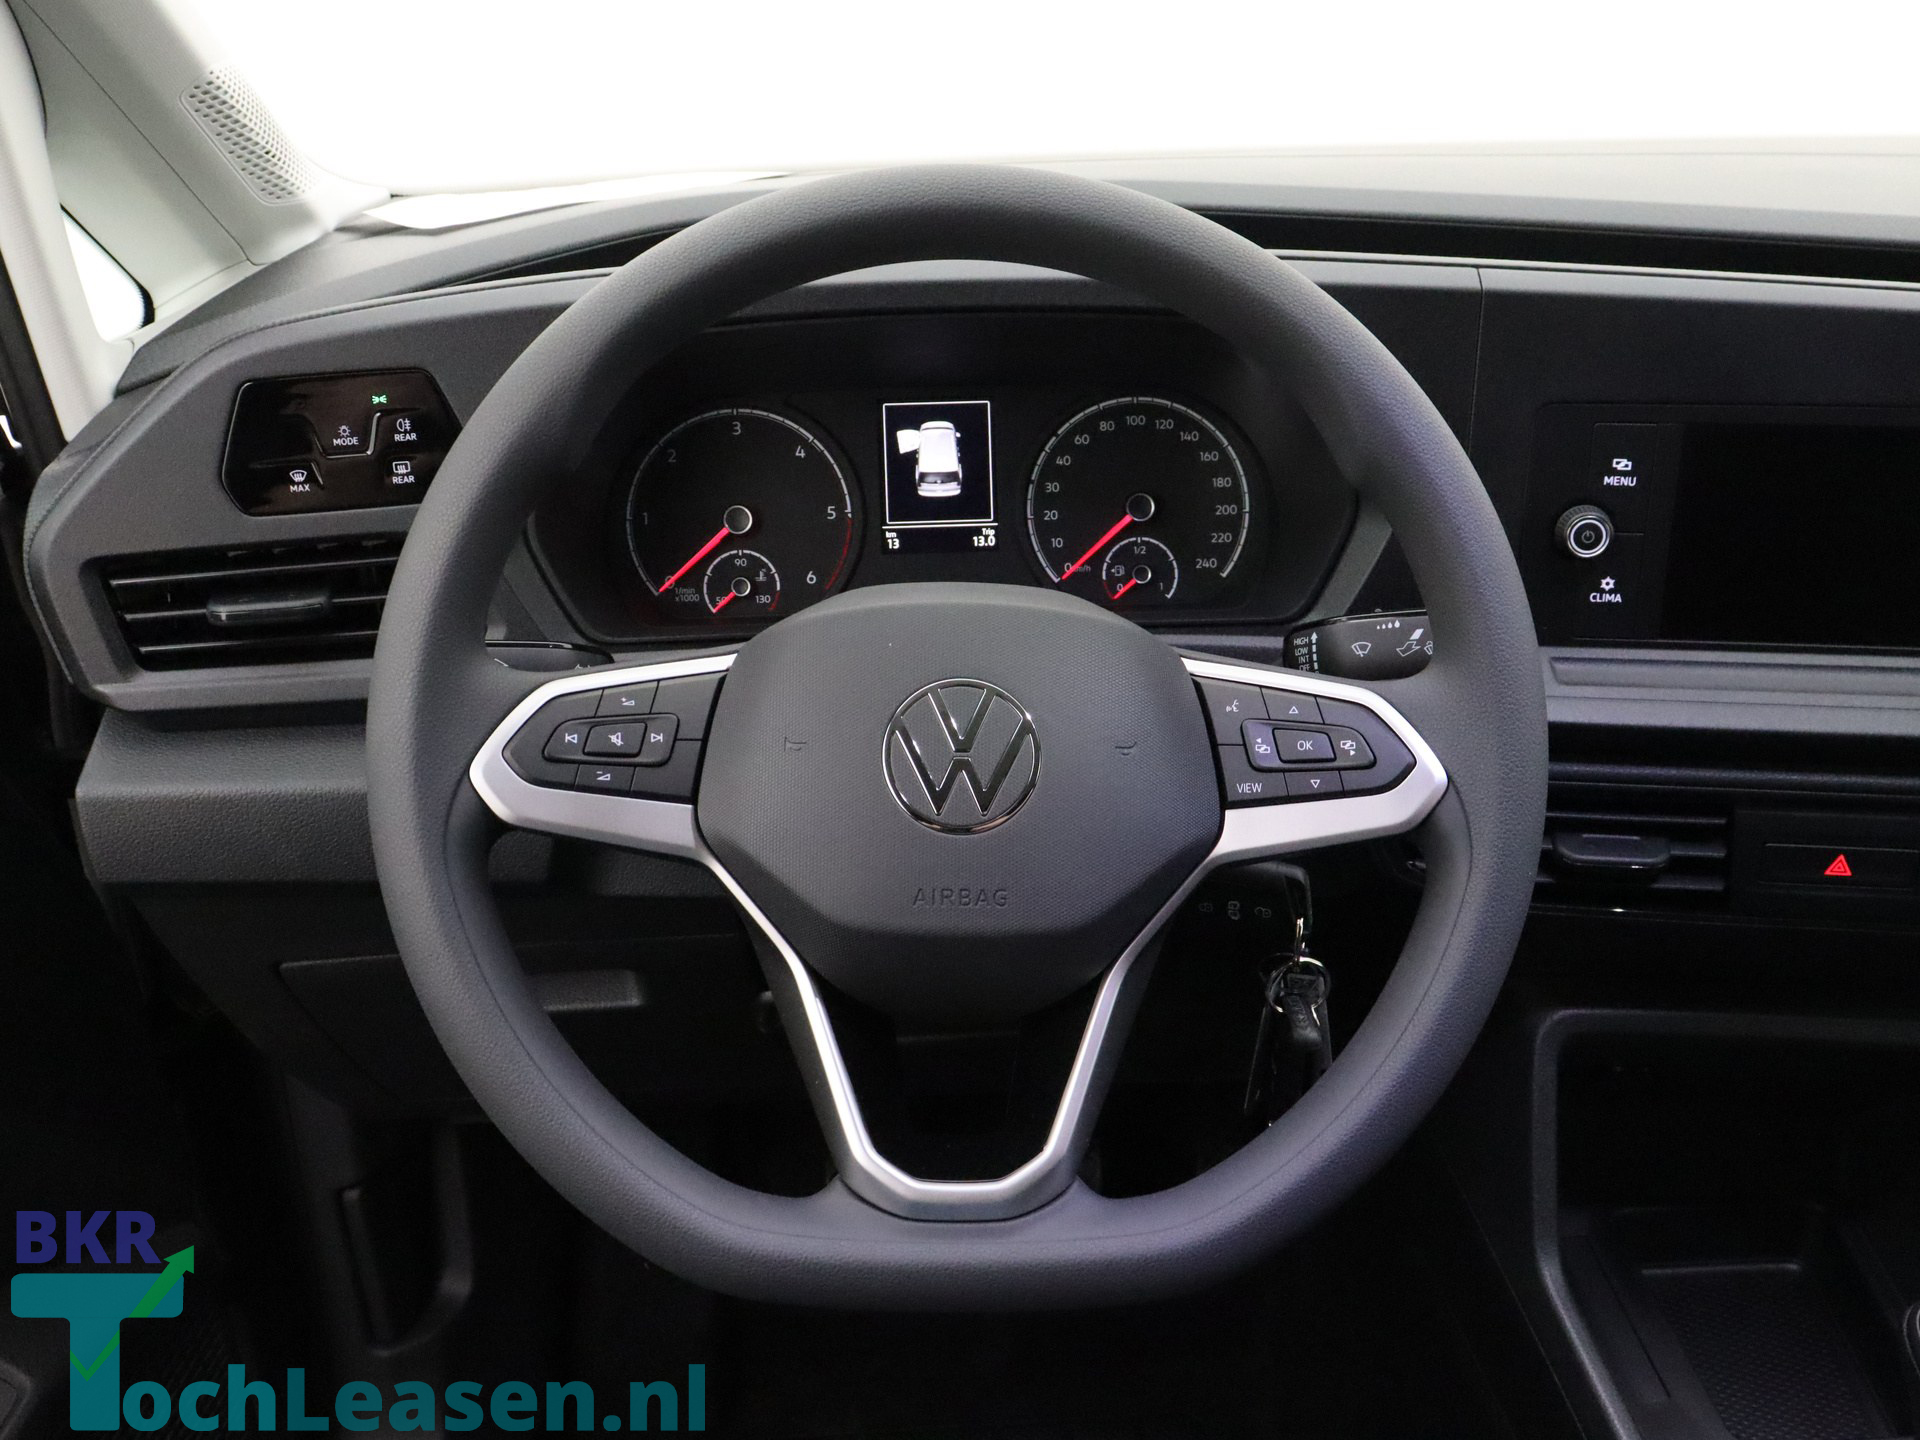 BKR toch leasen - Volkswagen Caddy - Grijs 4